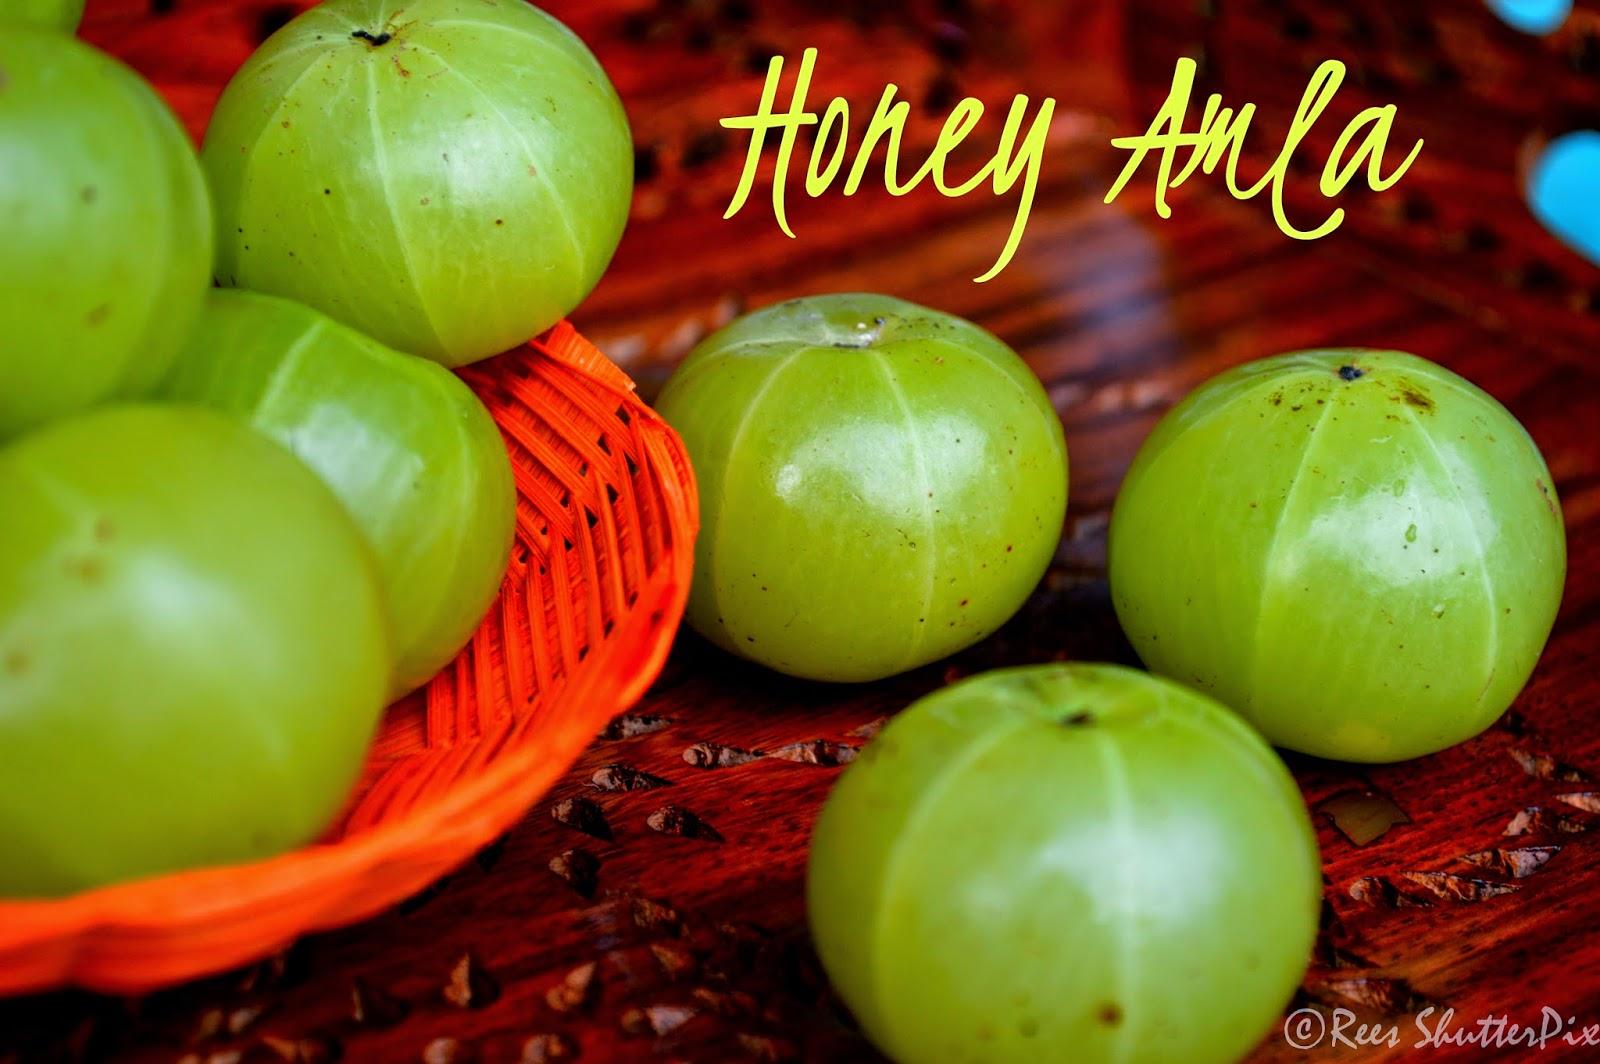 how to make amla honey, amla in honey recipe